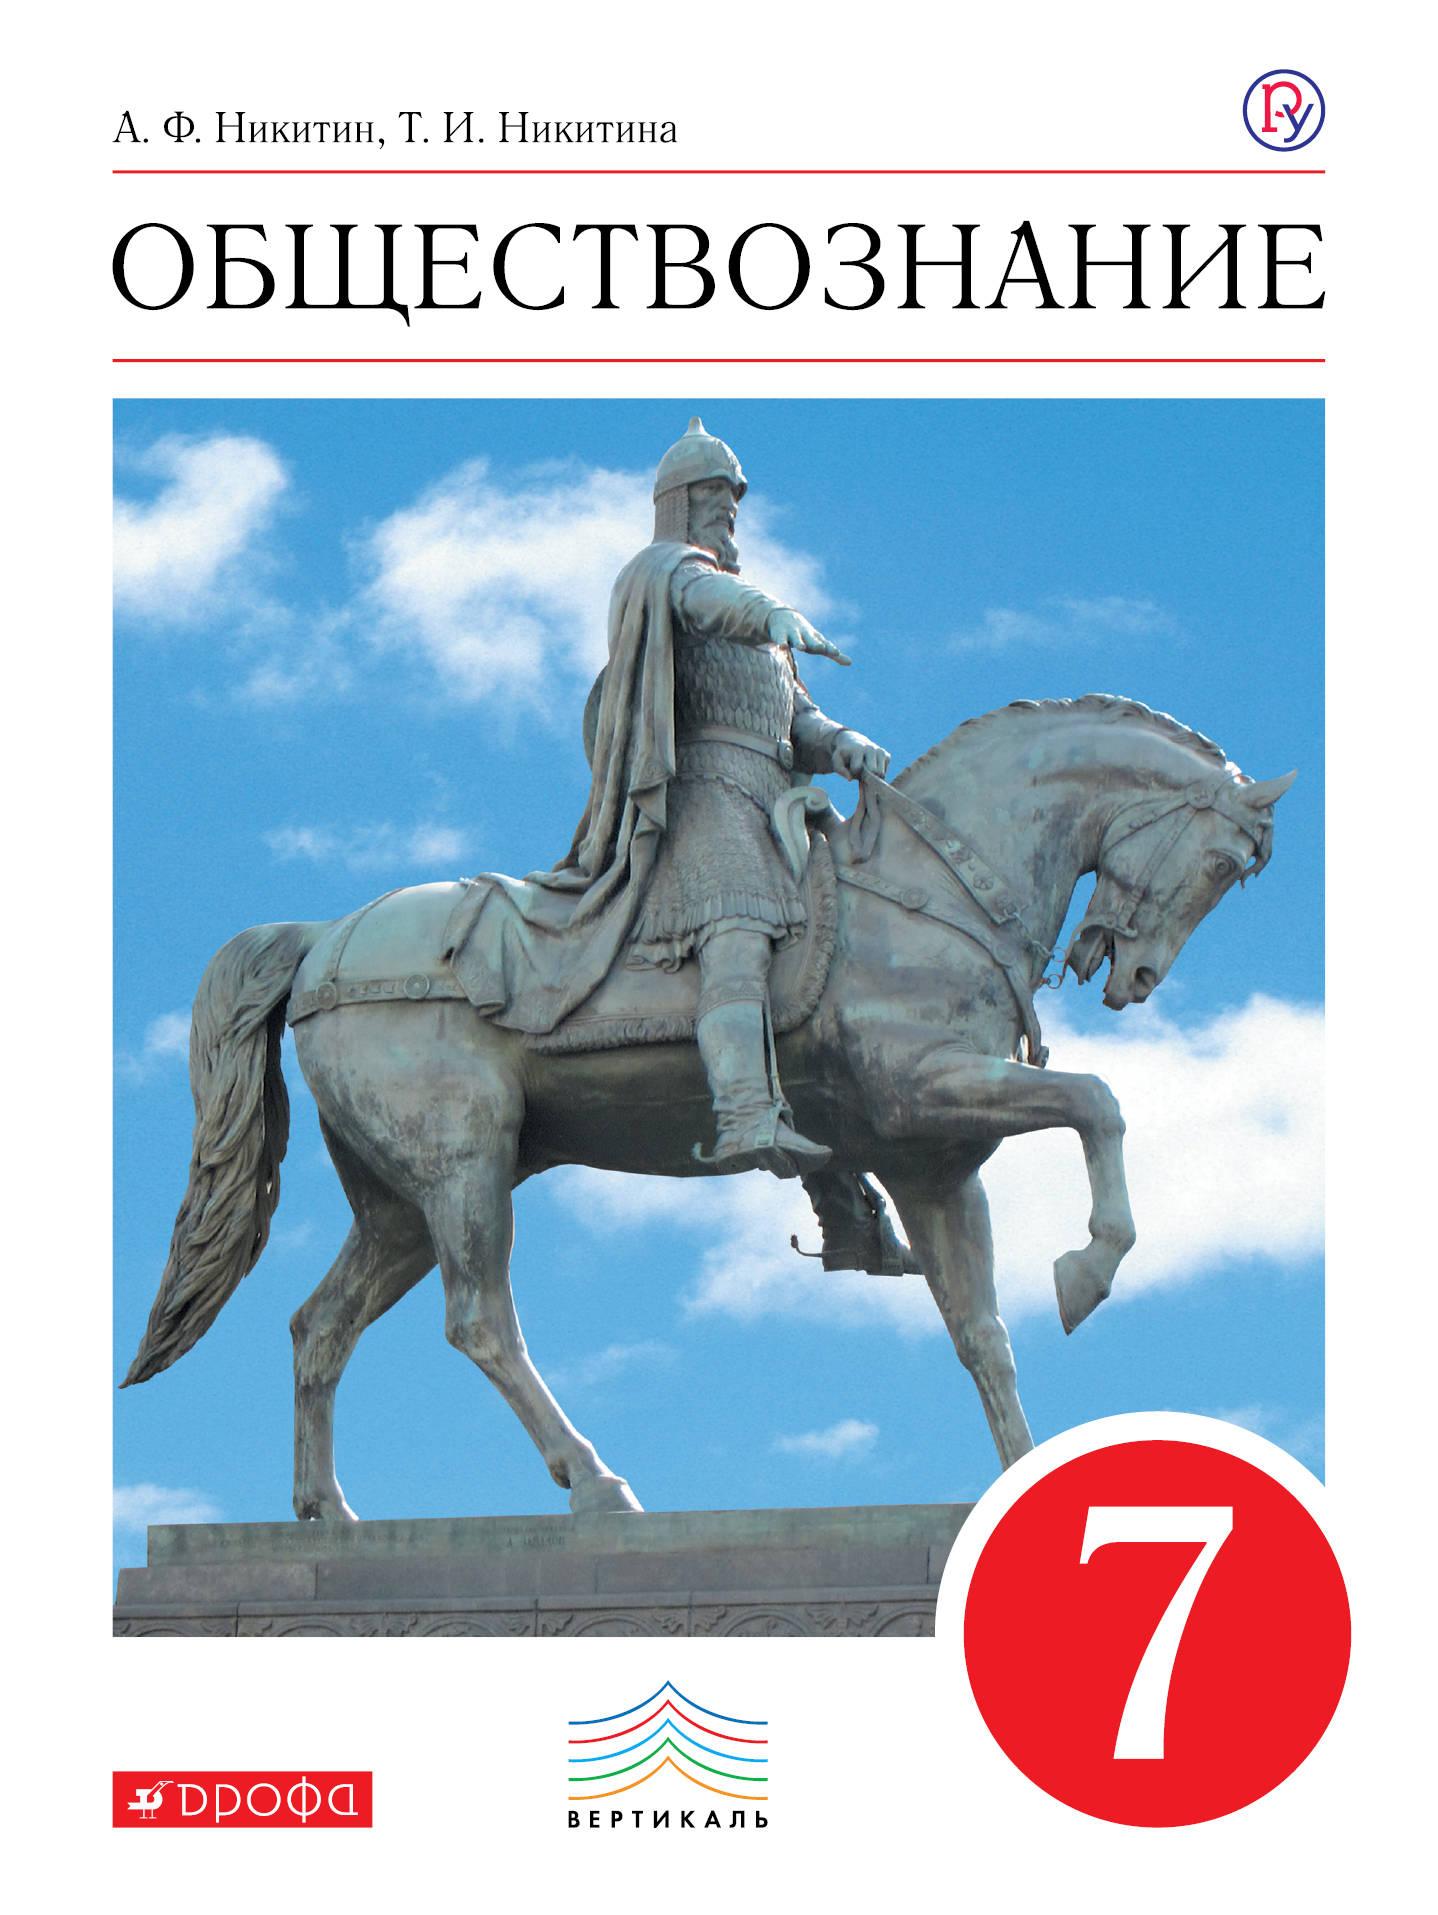 А. Ф. Никитин,Т. И. Никитина Обществознание. 7 класс. Учебник